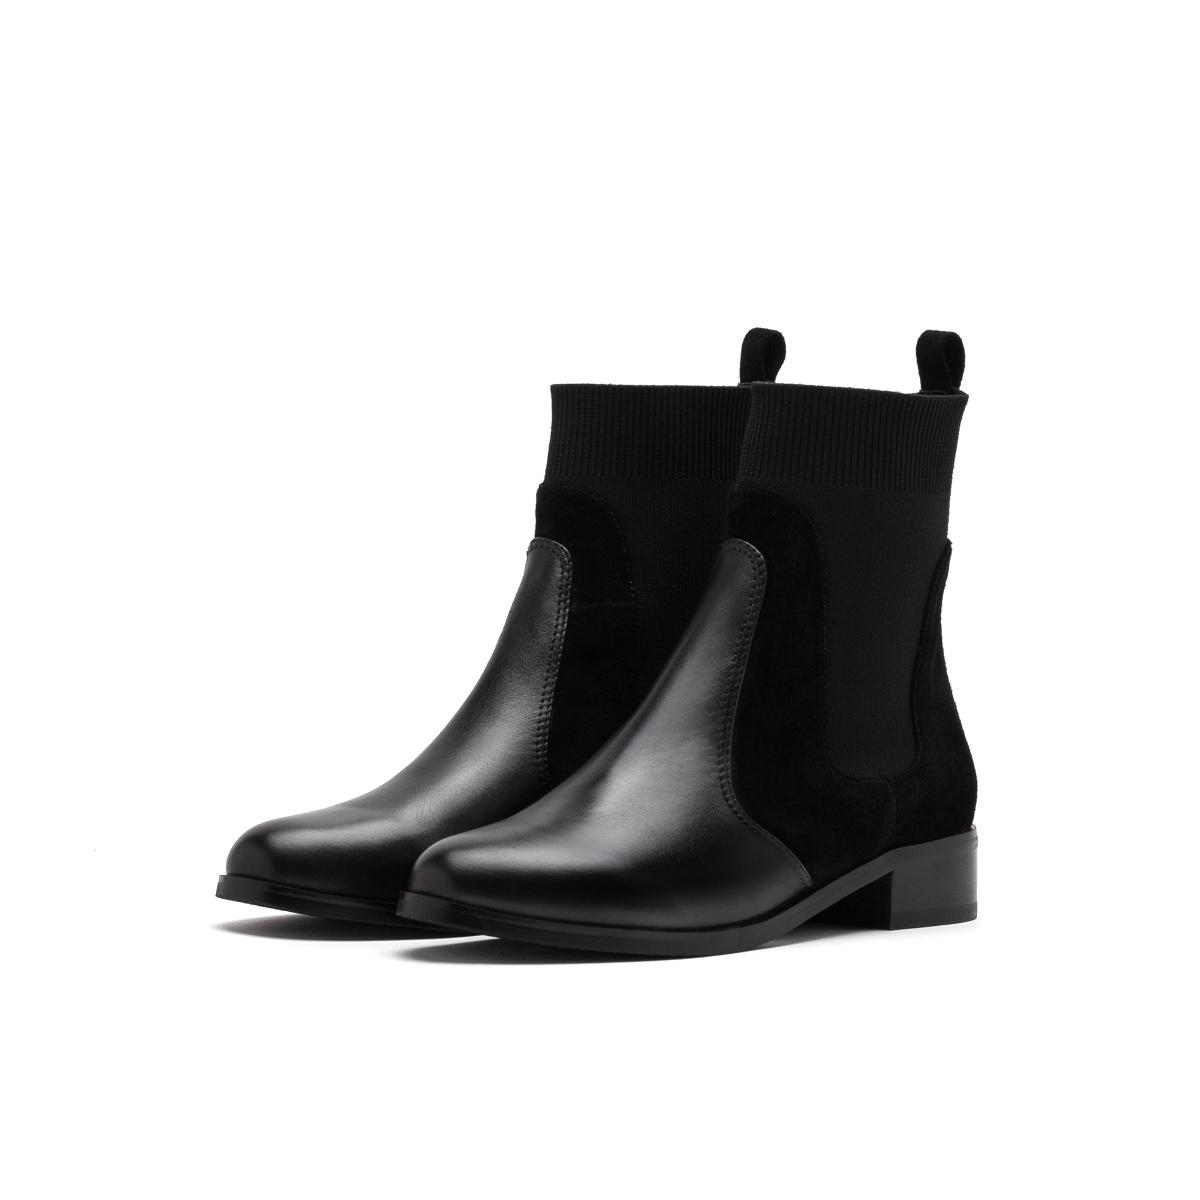 SS94116281 秋冬新款圆头低跟粗跟切尔西靴女靴 2019 星期六 Sat & St